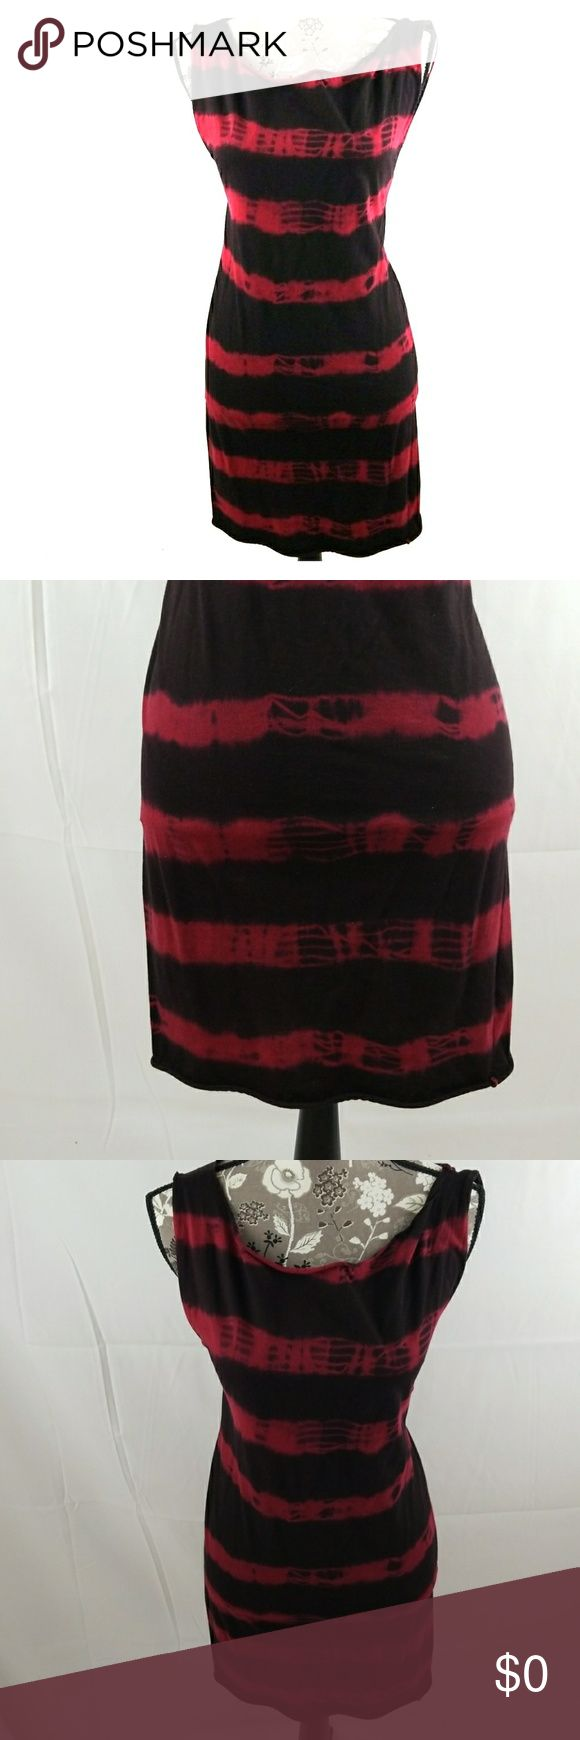 American Apparel T shirt Dress American Apparel cotton t-shirt dress. Made in the USA.  100%cotton, 17 1/2 in armpit to armpit.  33in. Long. Dresses